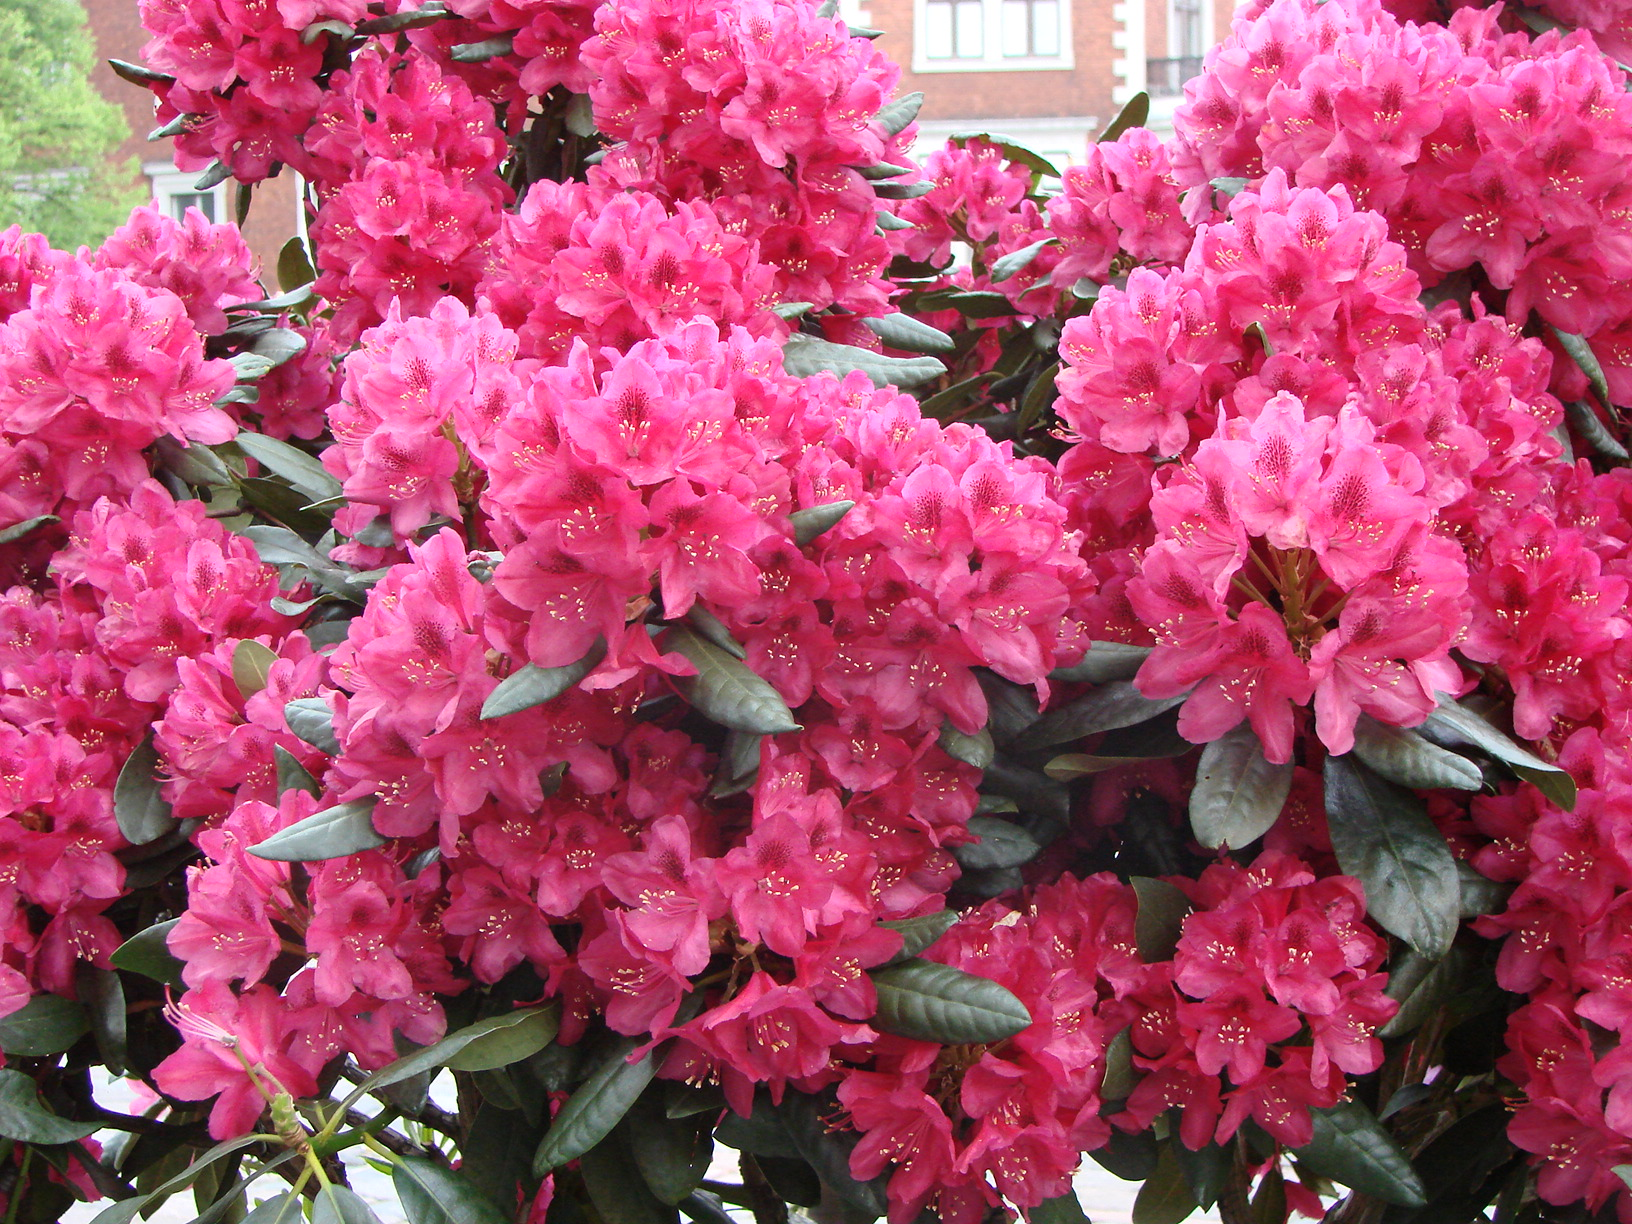 Rhododendron ``Nova Zembla``